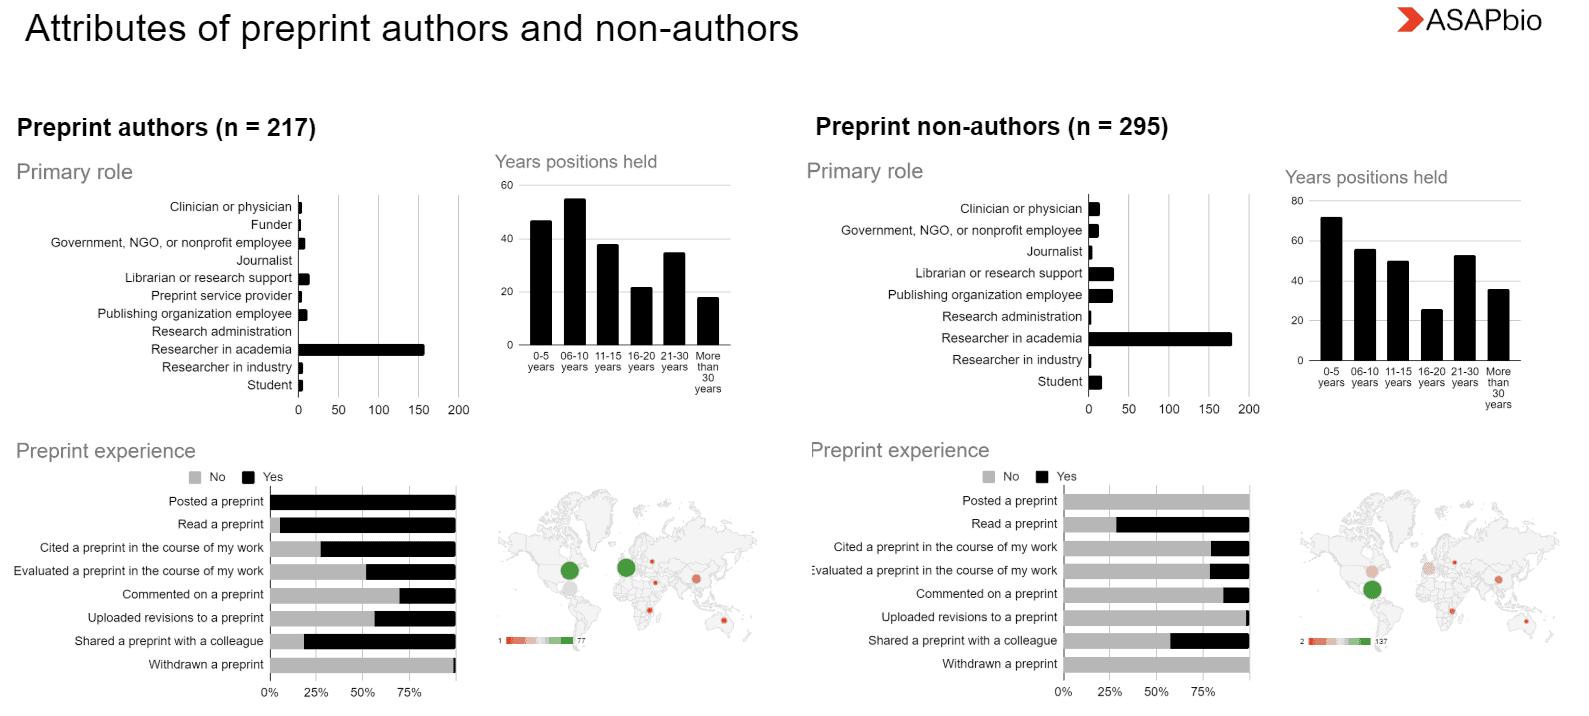 Comparing preprint authors vs non-authors